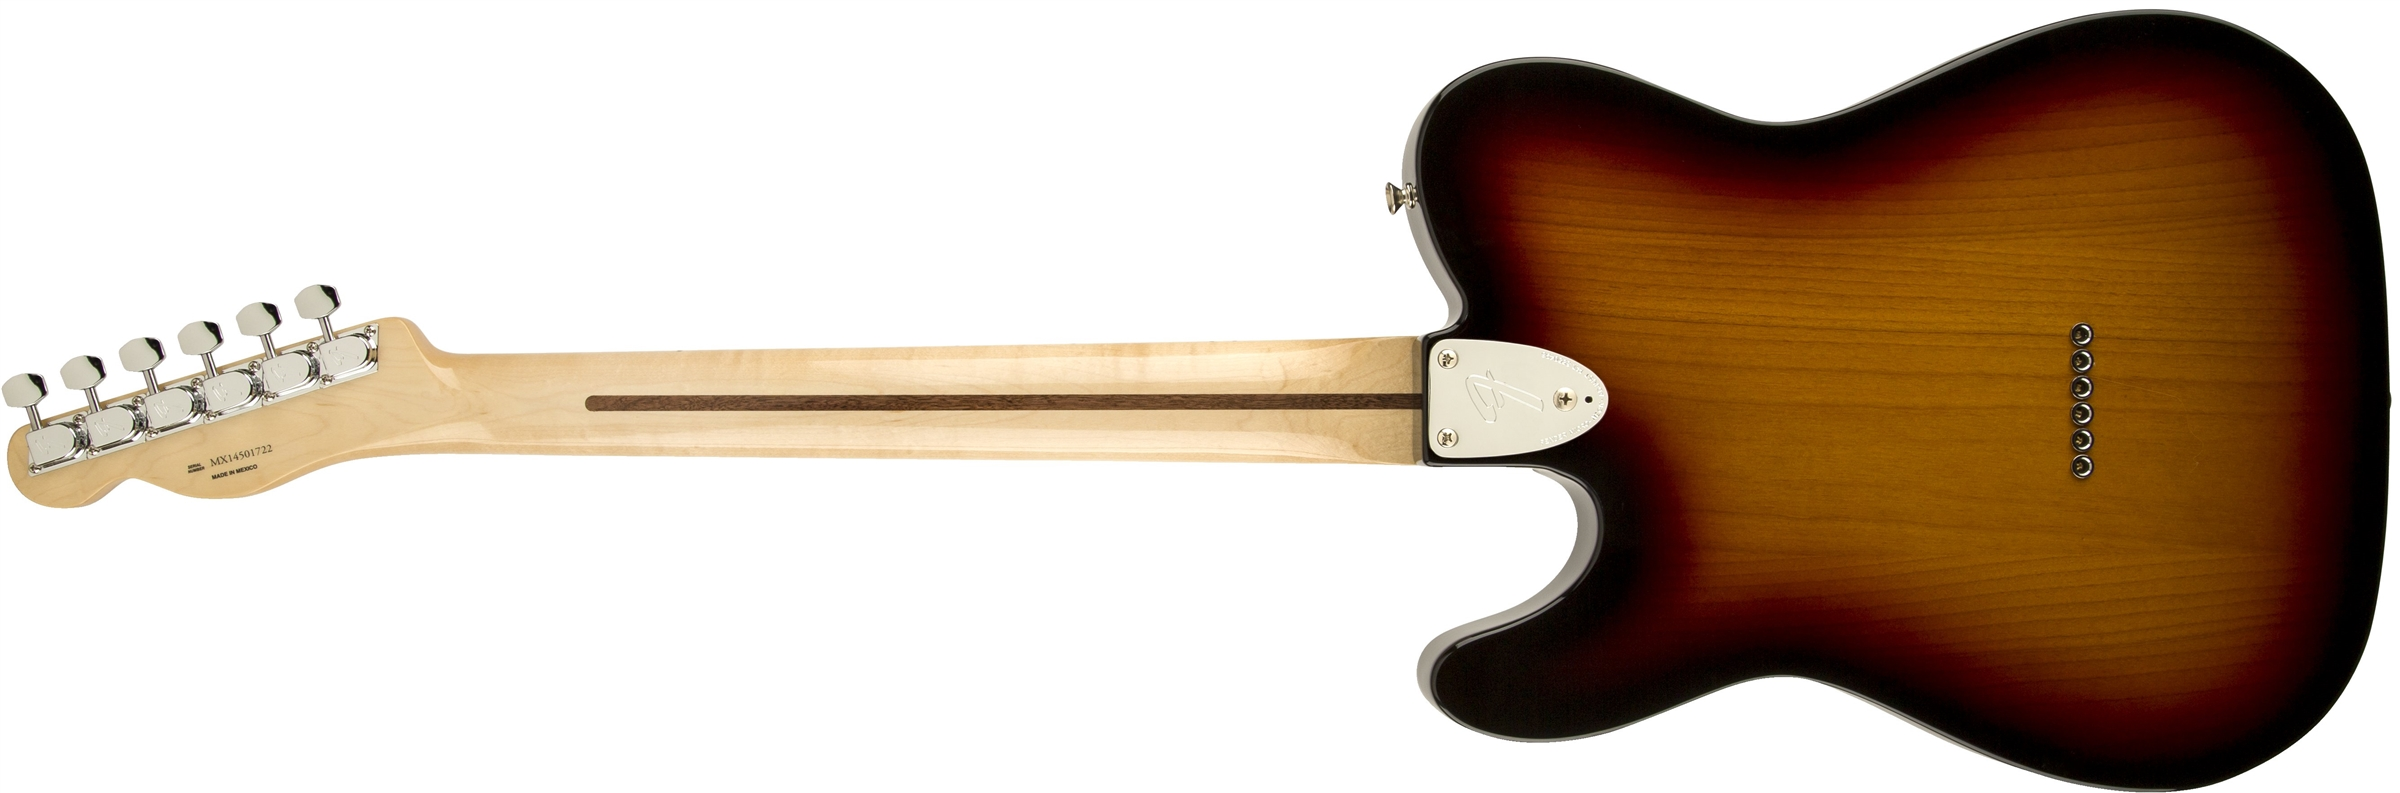 Fender Nashville Telecaster Wiring Diagram - Merzie.net